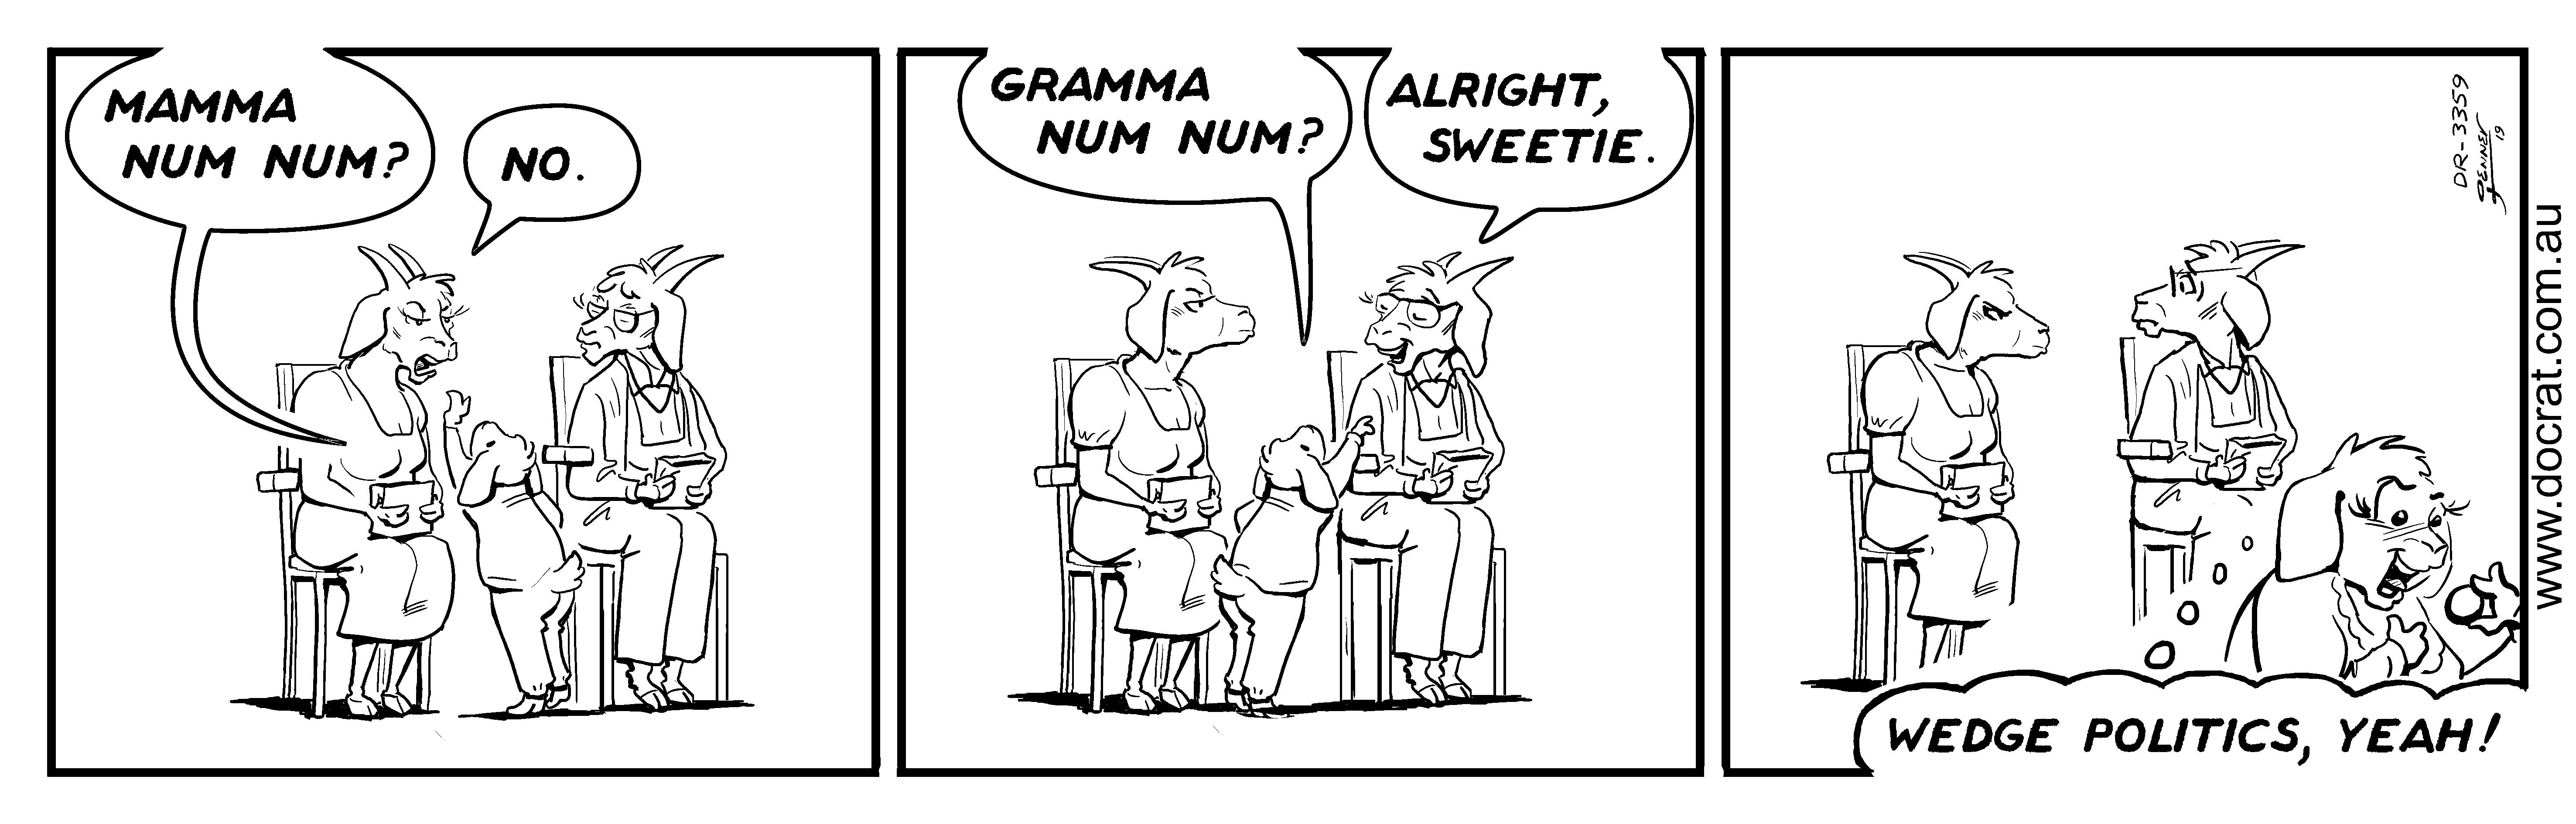 20191107